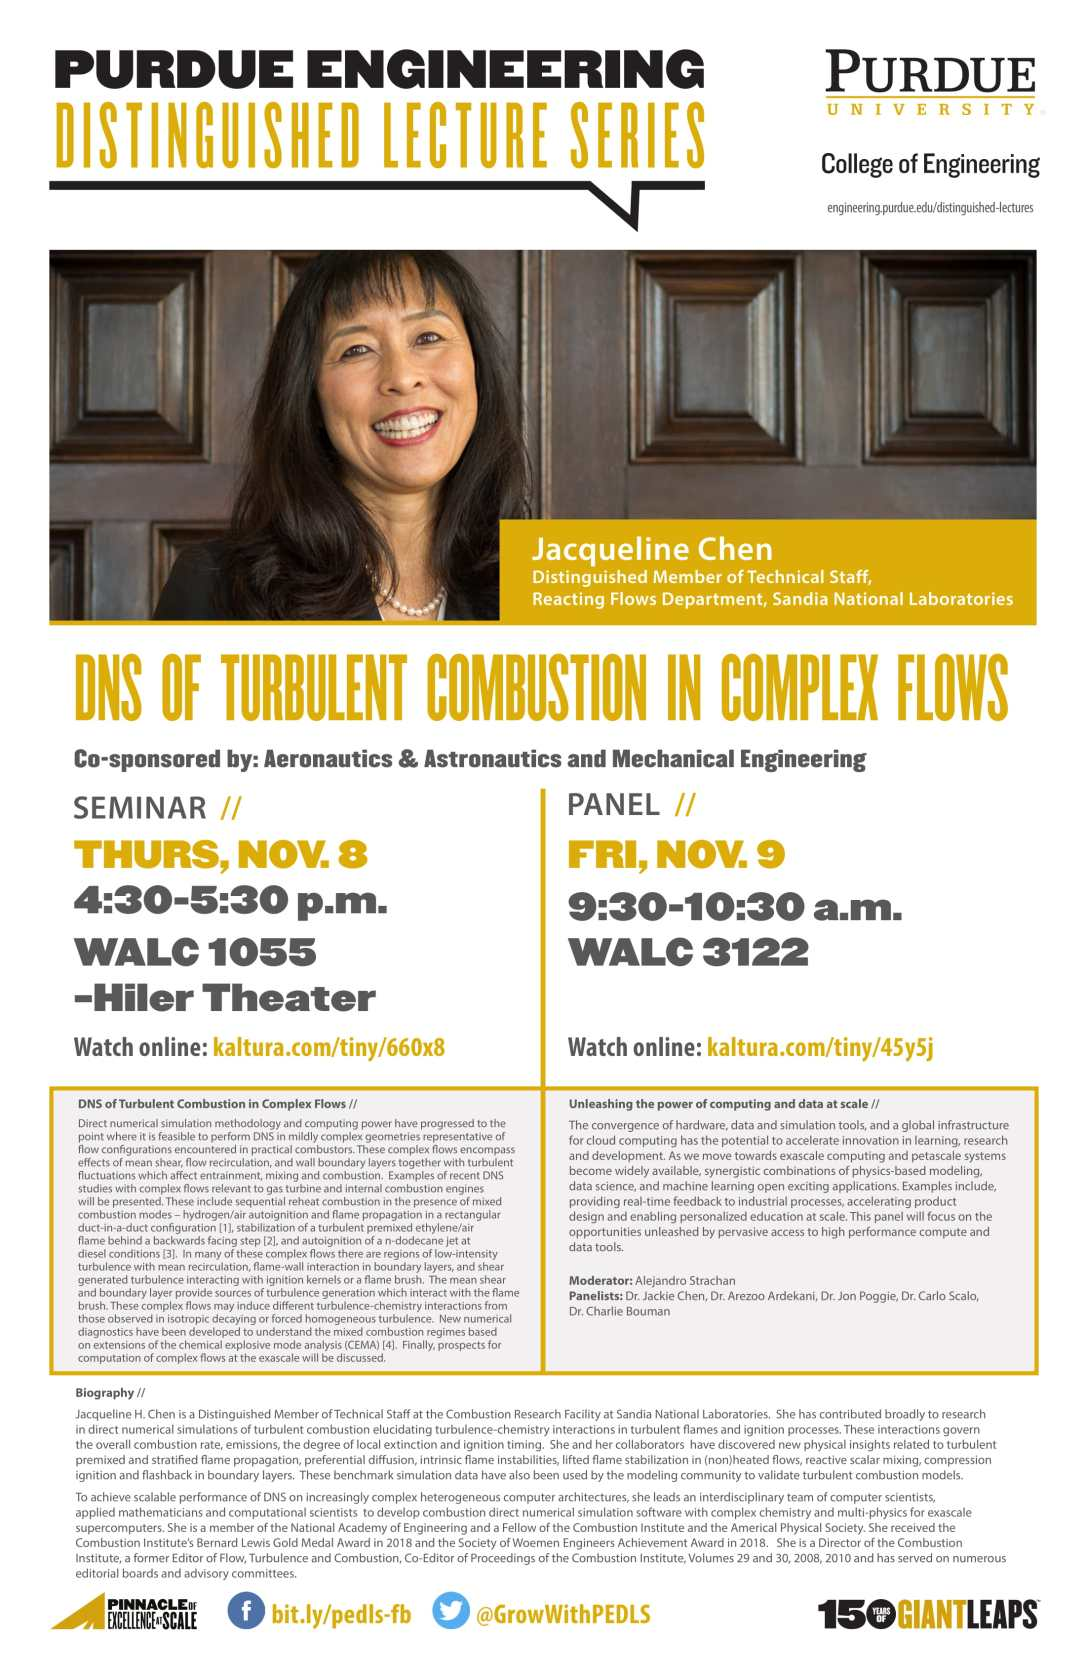 LectureSeries-JacquelineChen-11x17-1